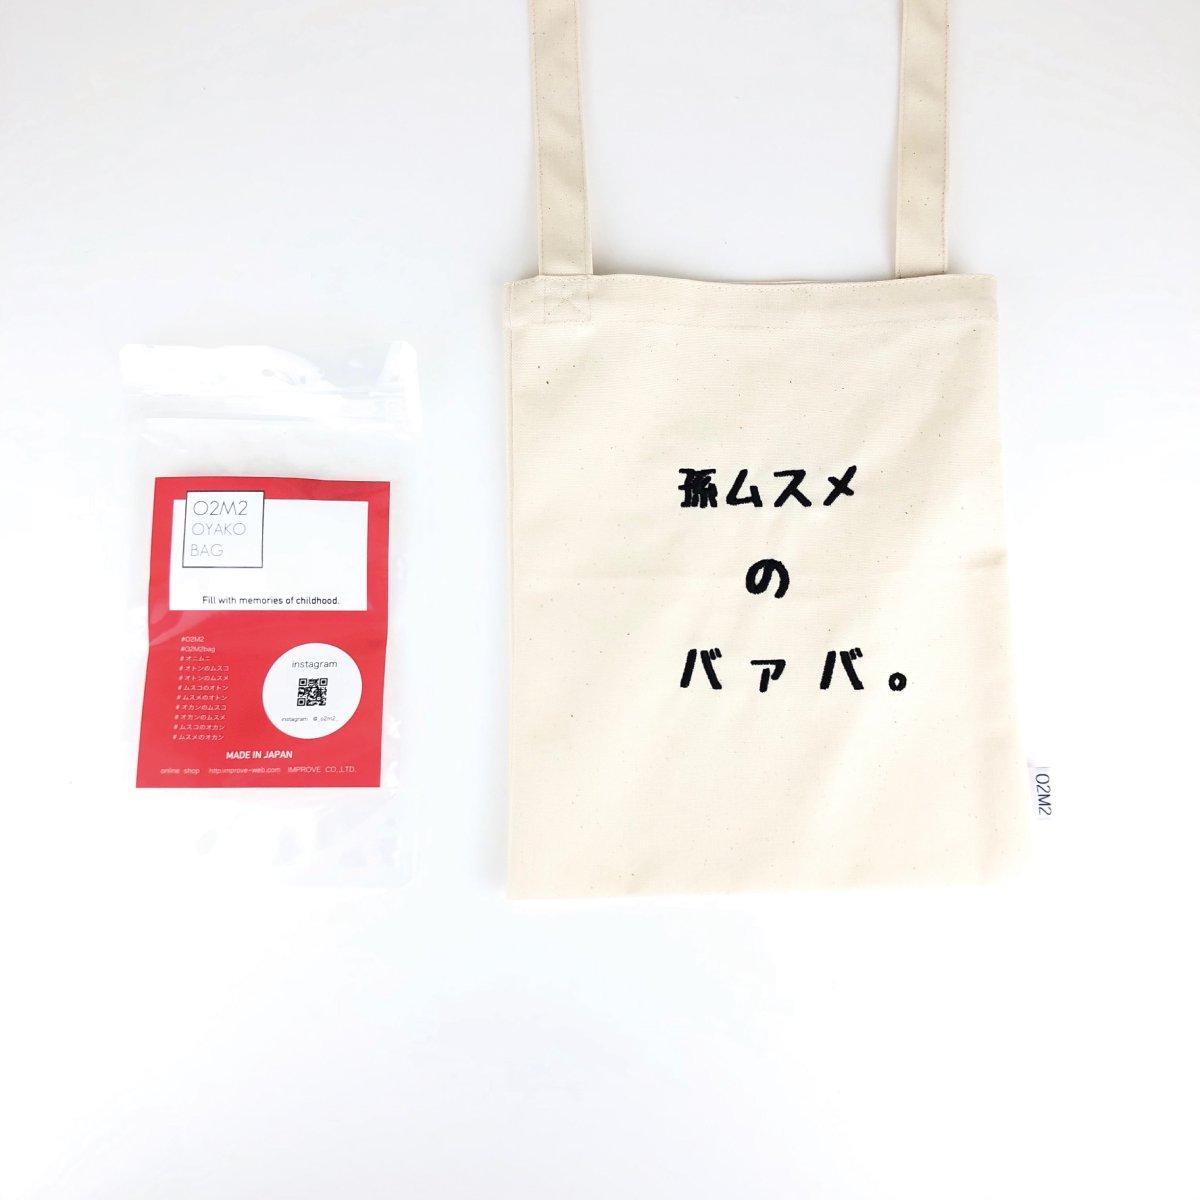 Cotton HF Sacoche(孫・ジィジ&バァバシリーズ) 詳細画像2